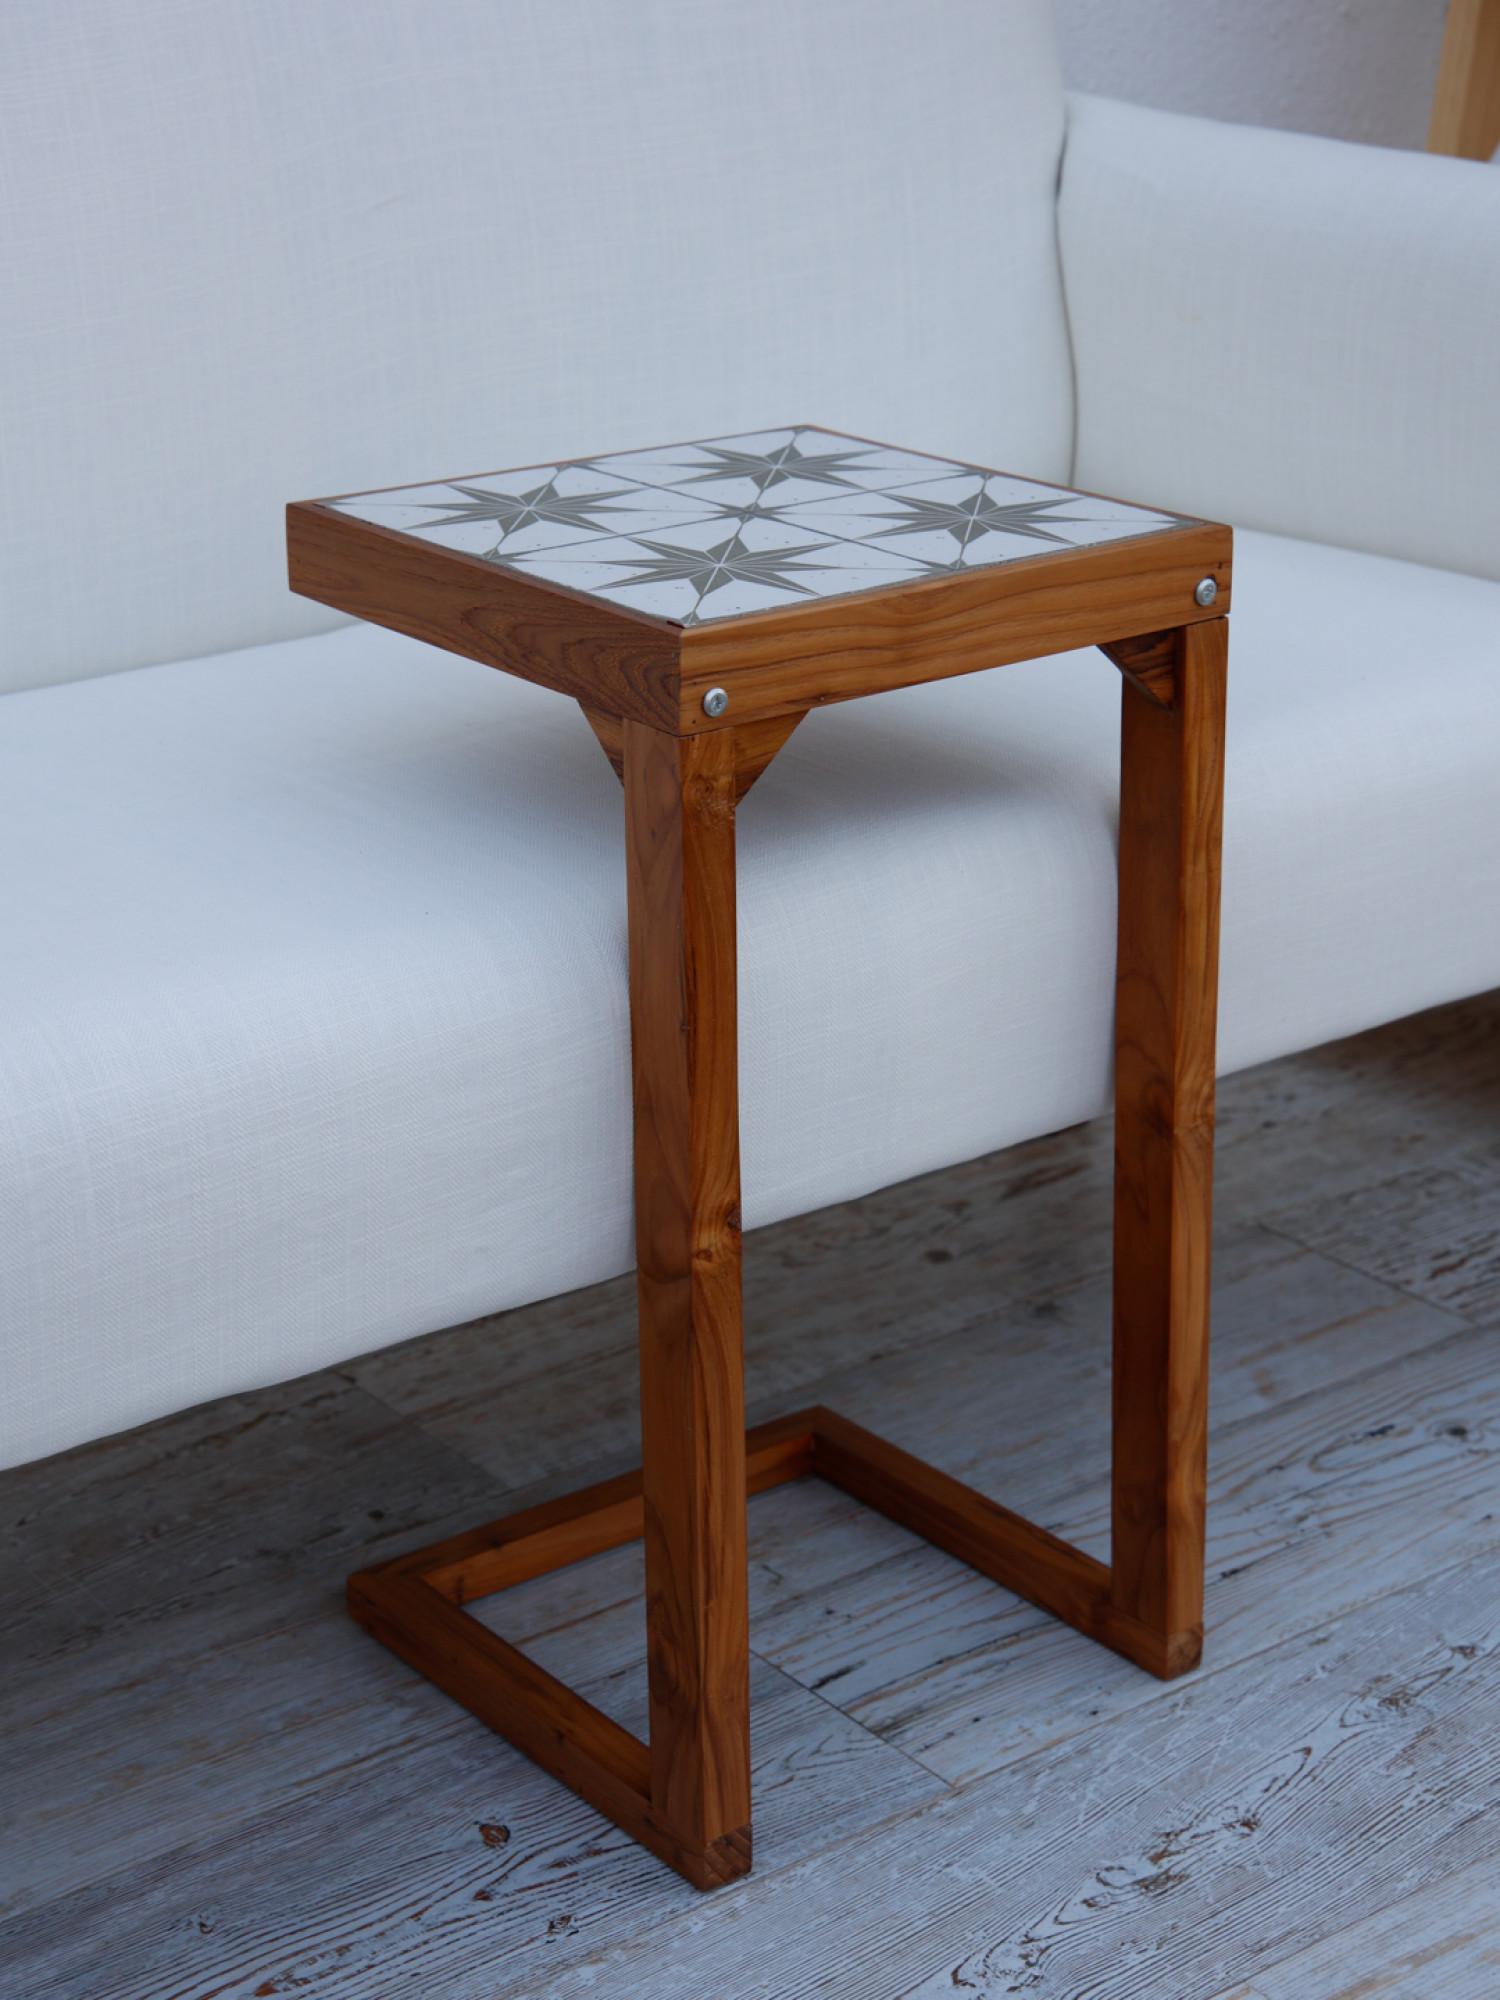 Positano Tiles & Teak C-Table